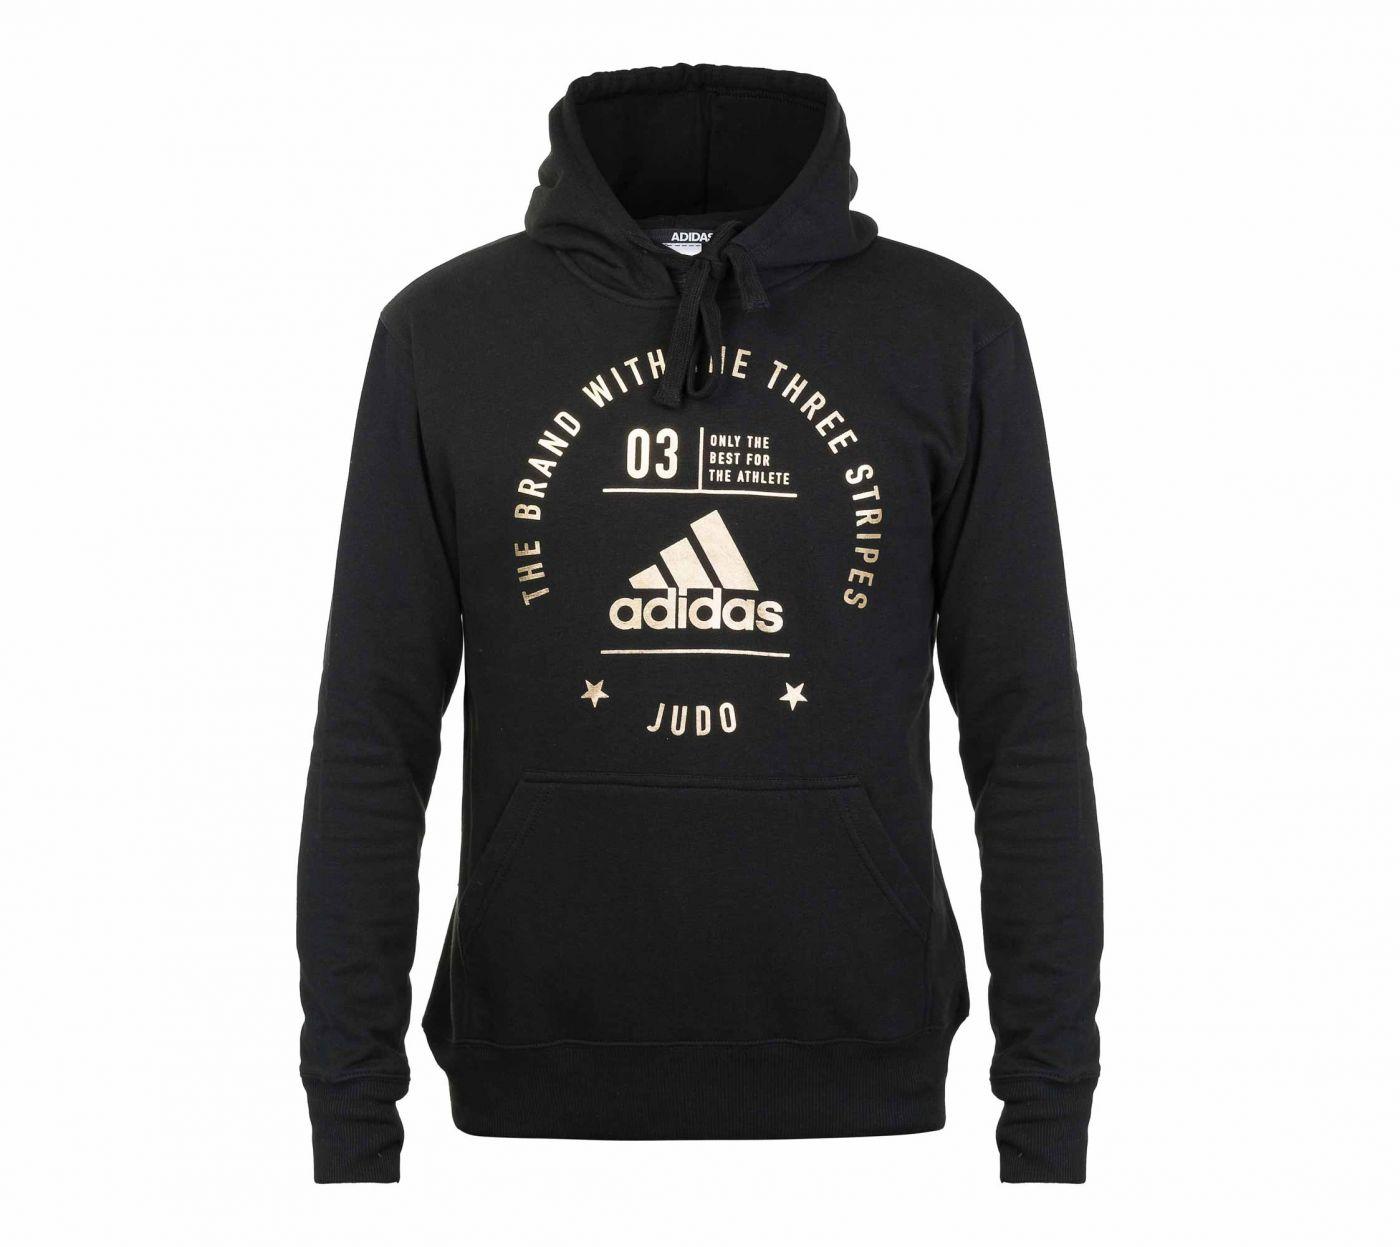 Толстовка Adidas с капюшоном (Худи) детская The Brand With The Three Stripes Judo Kids черно-золотая, размер 152, артикул adiCL02J-K